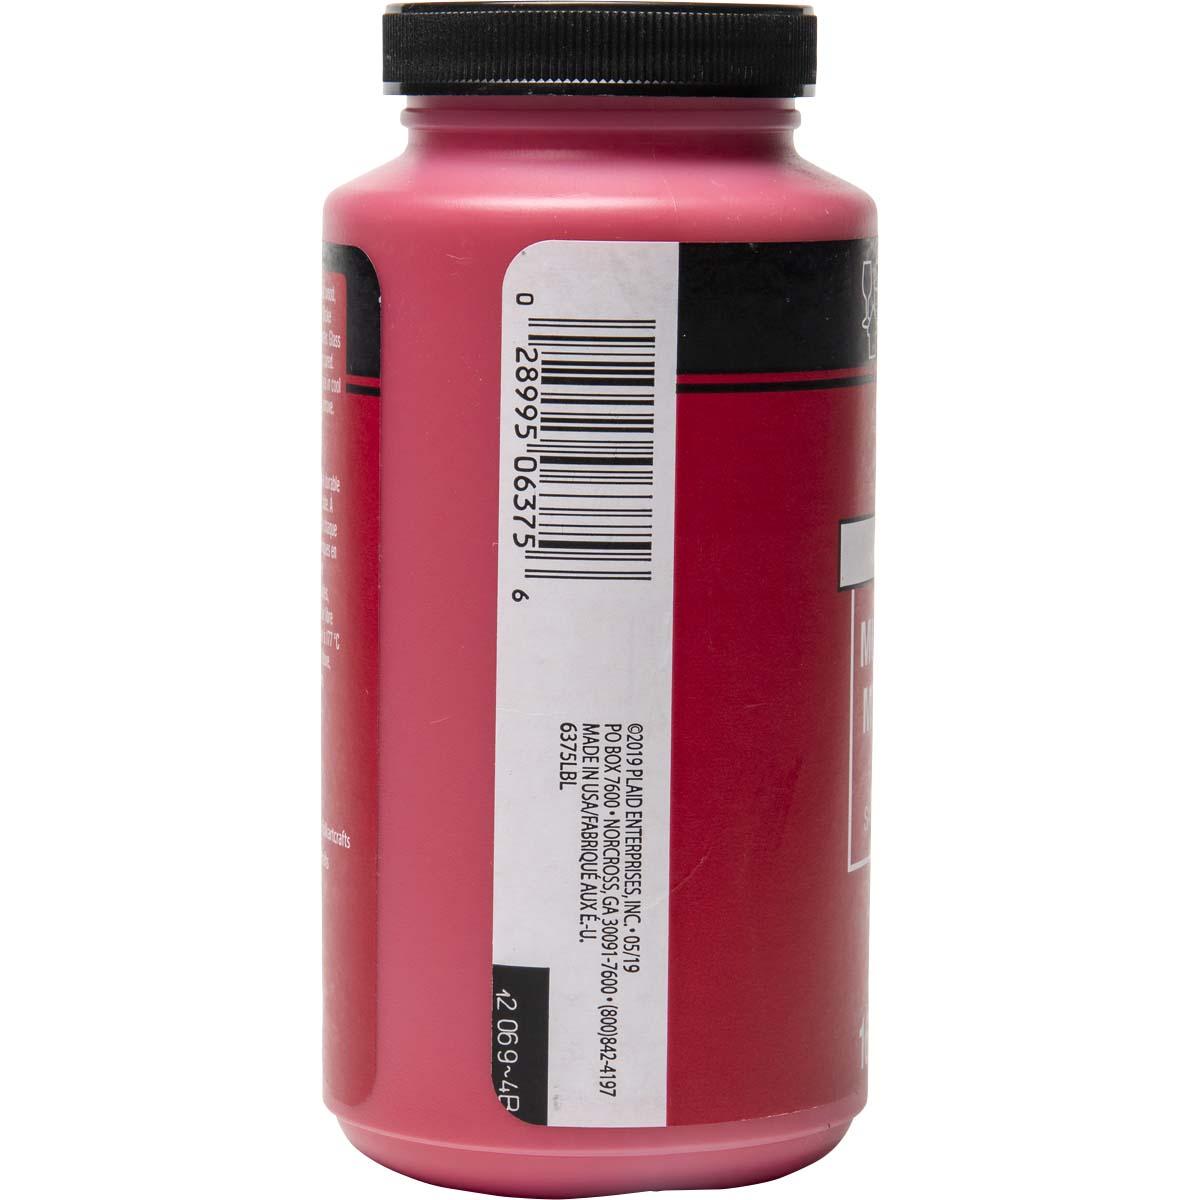 FolkArt ® Multi-Surface Satin Acrylic Paints - Apple Red, 16 oz. - 6375